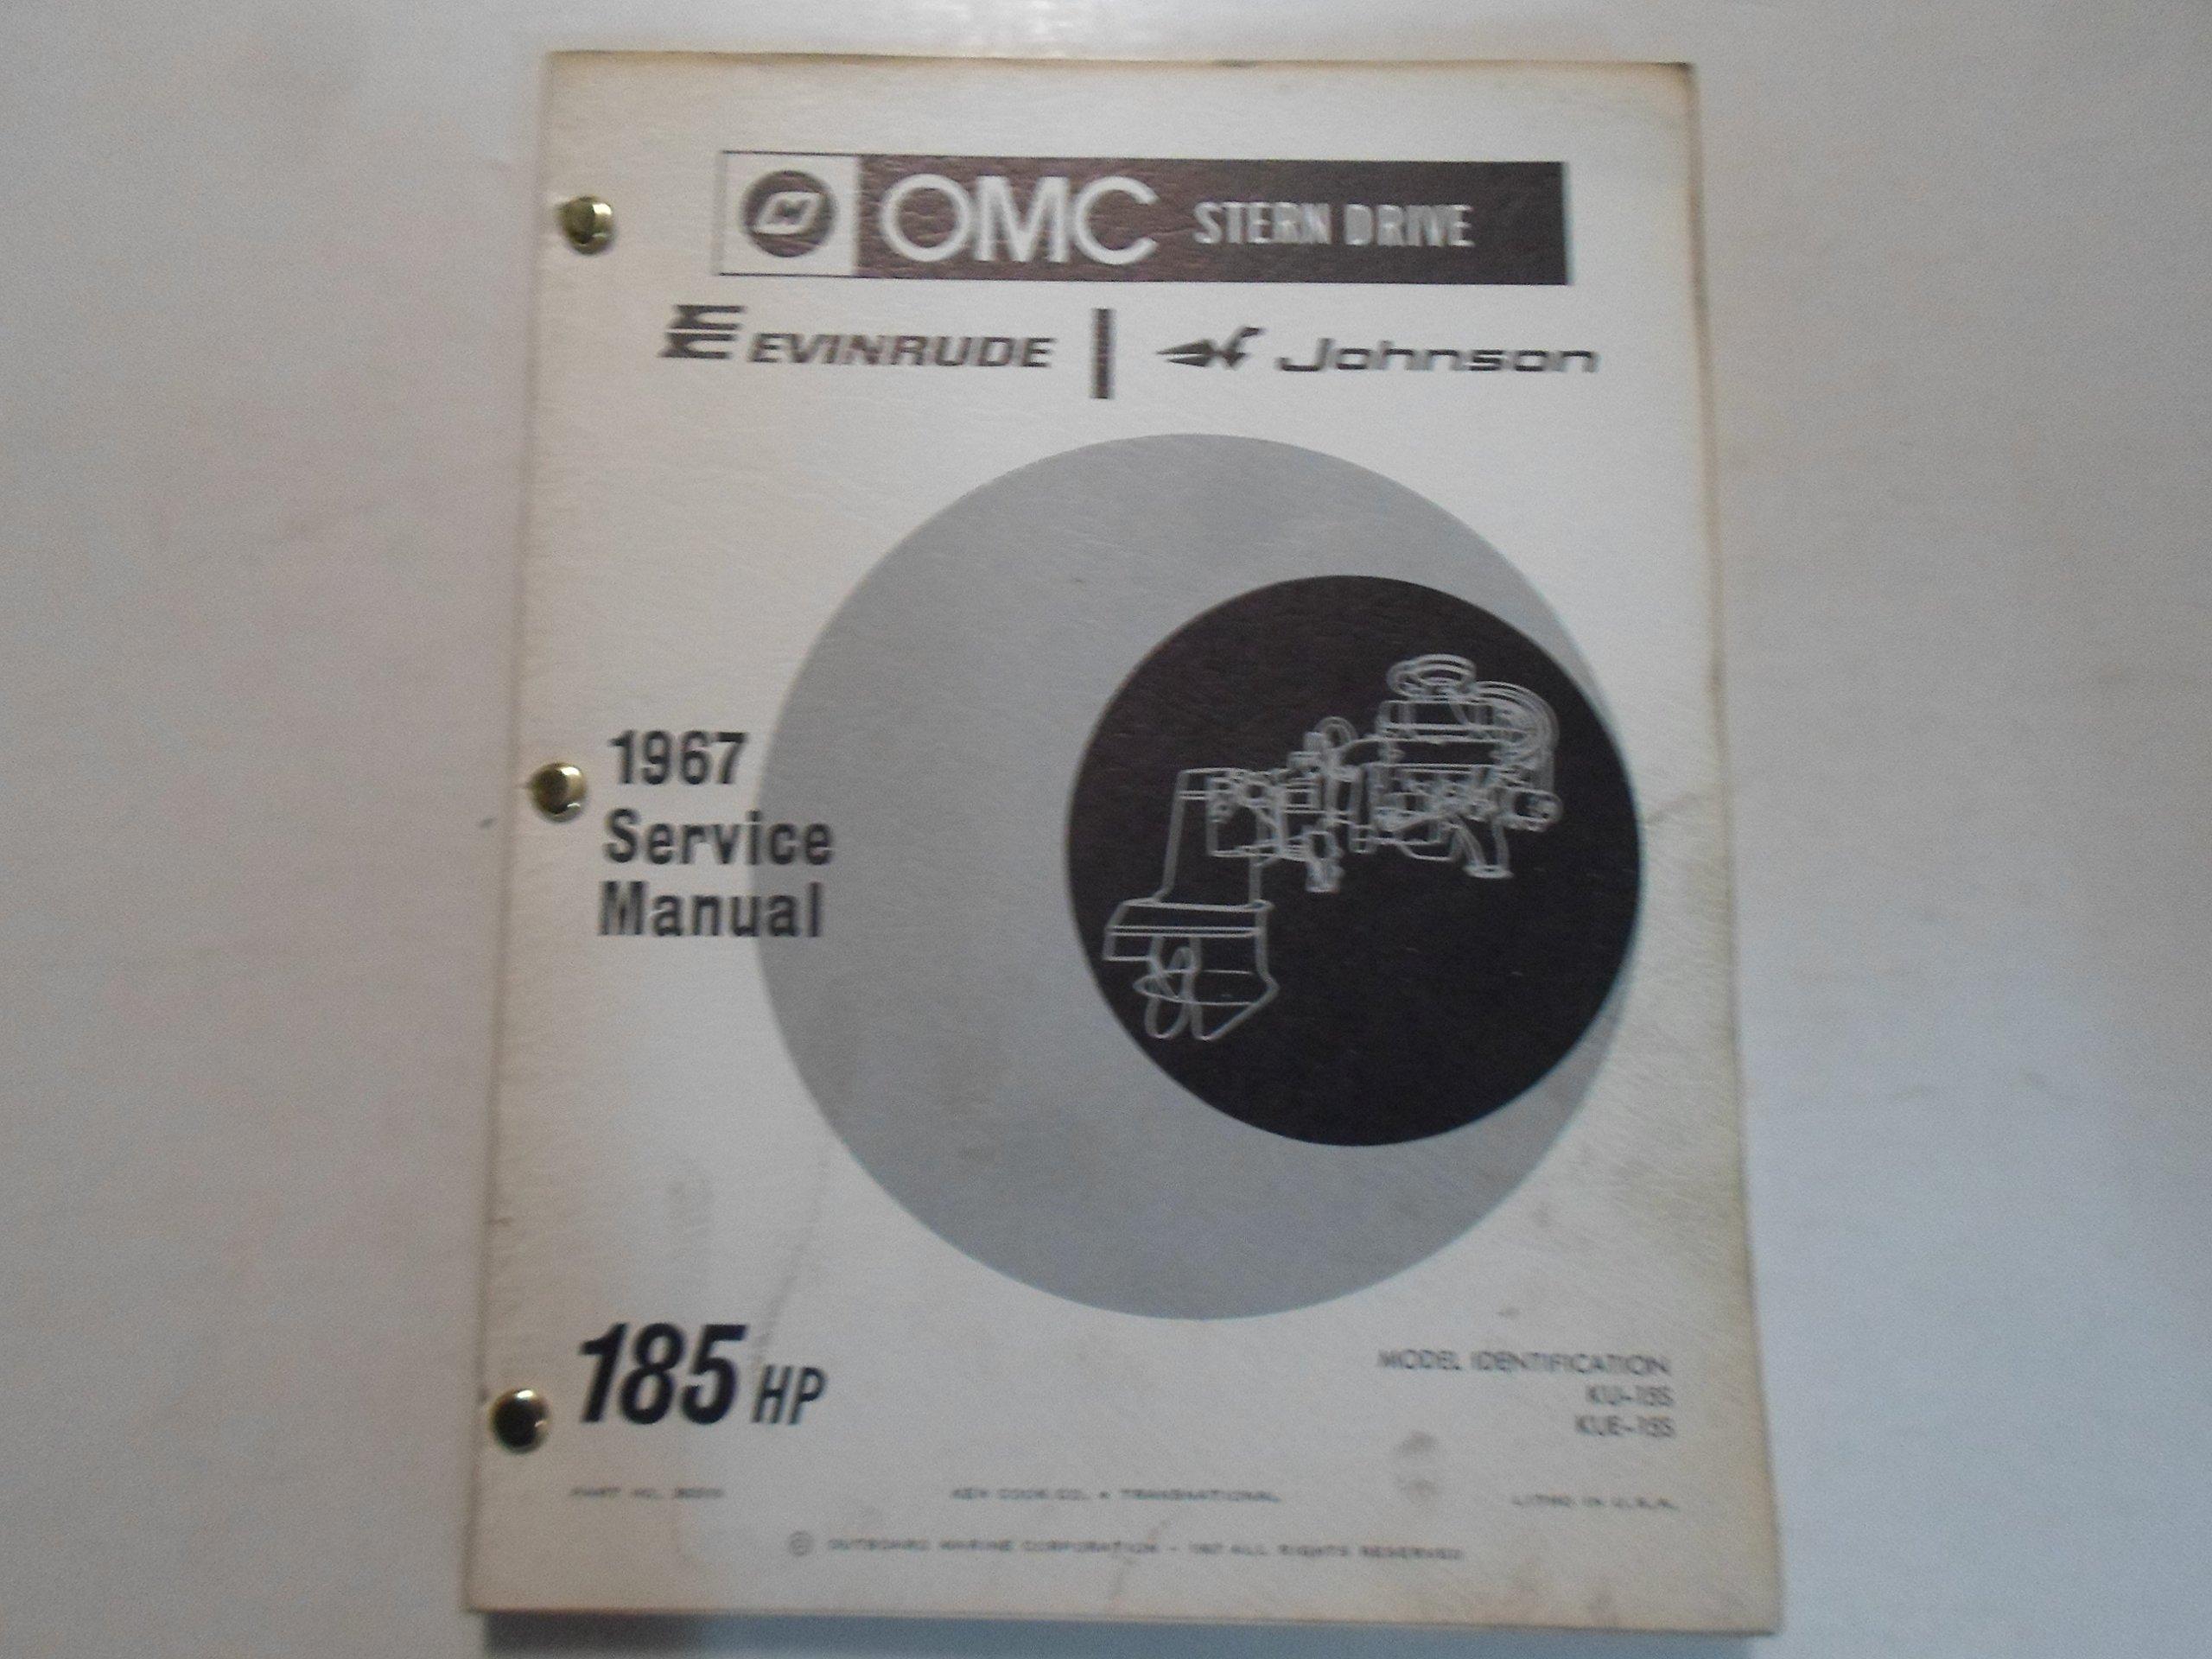 1967 EVINRUDE/JOHNSON OMC STERN DRIVE 185 HP MANUAL: OMC: Amazon.com: Books